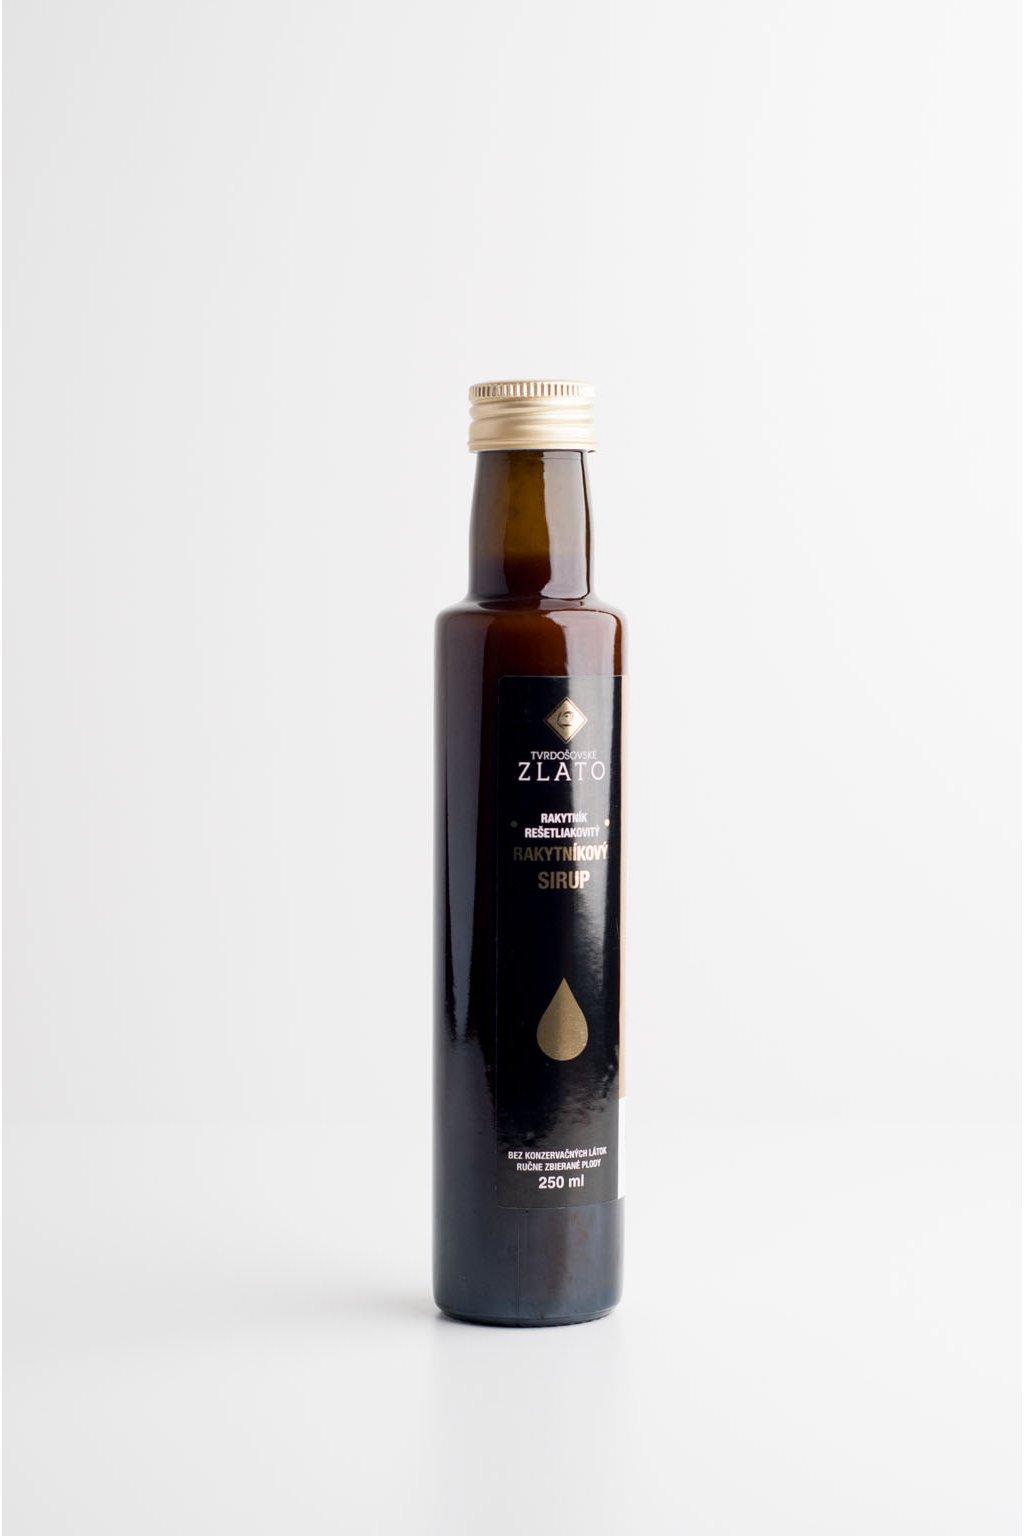 Rakytníkový sirup - 0,25l